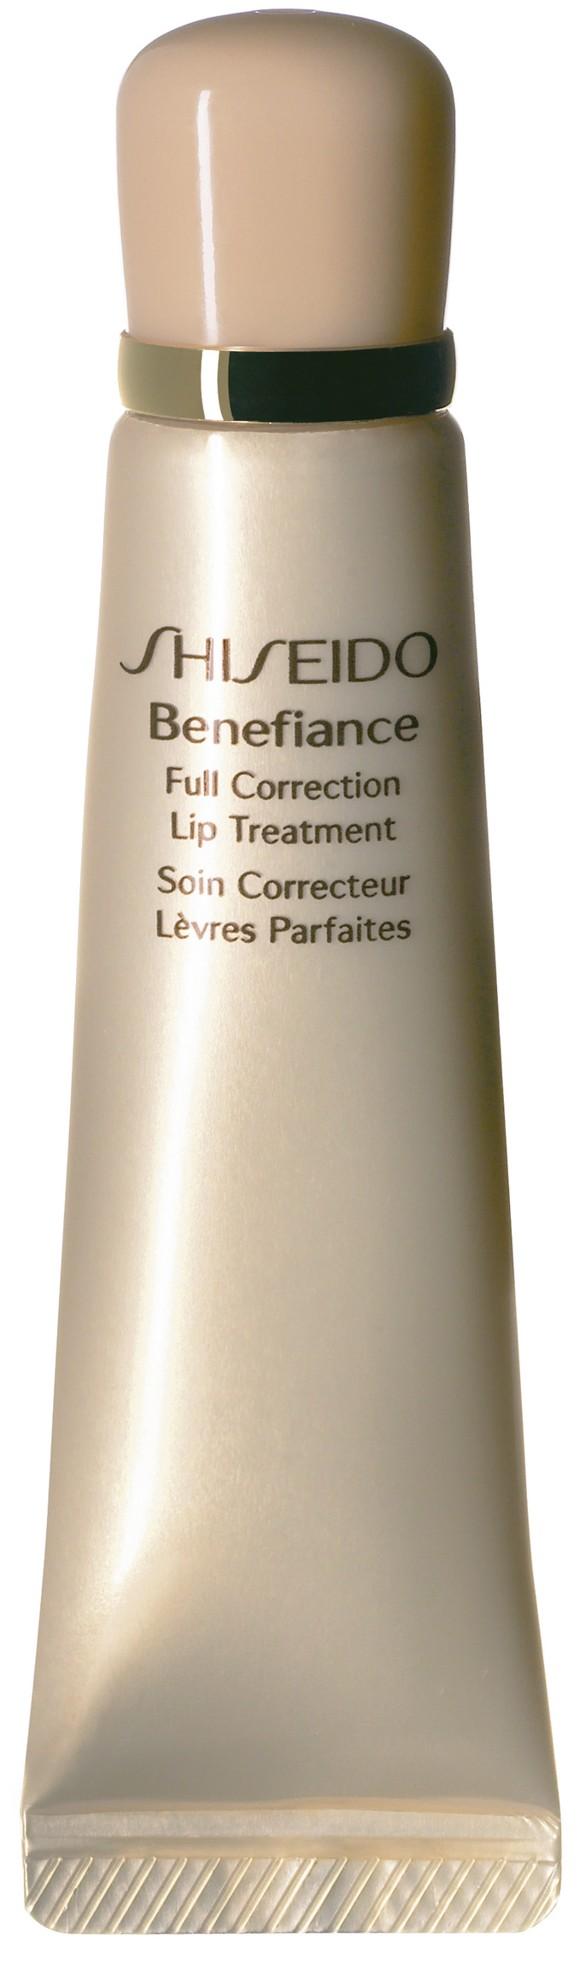 Shiseido - Benefiance Full Correction Lip Treatment 15 ml